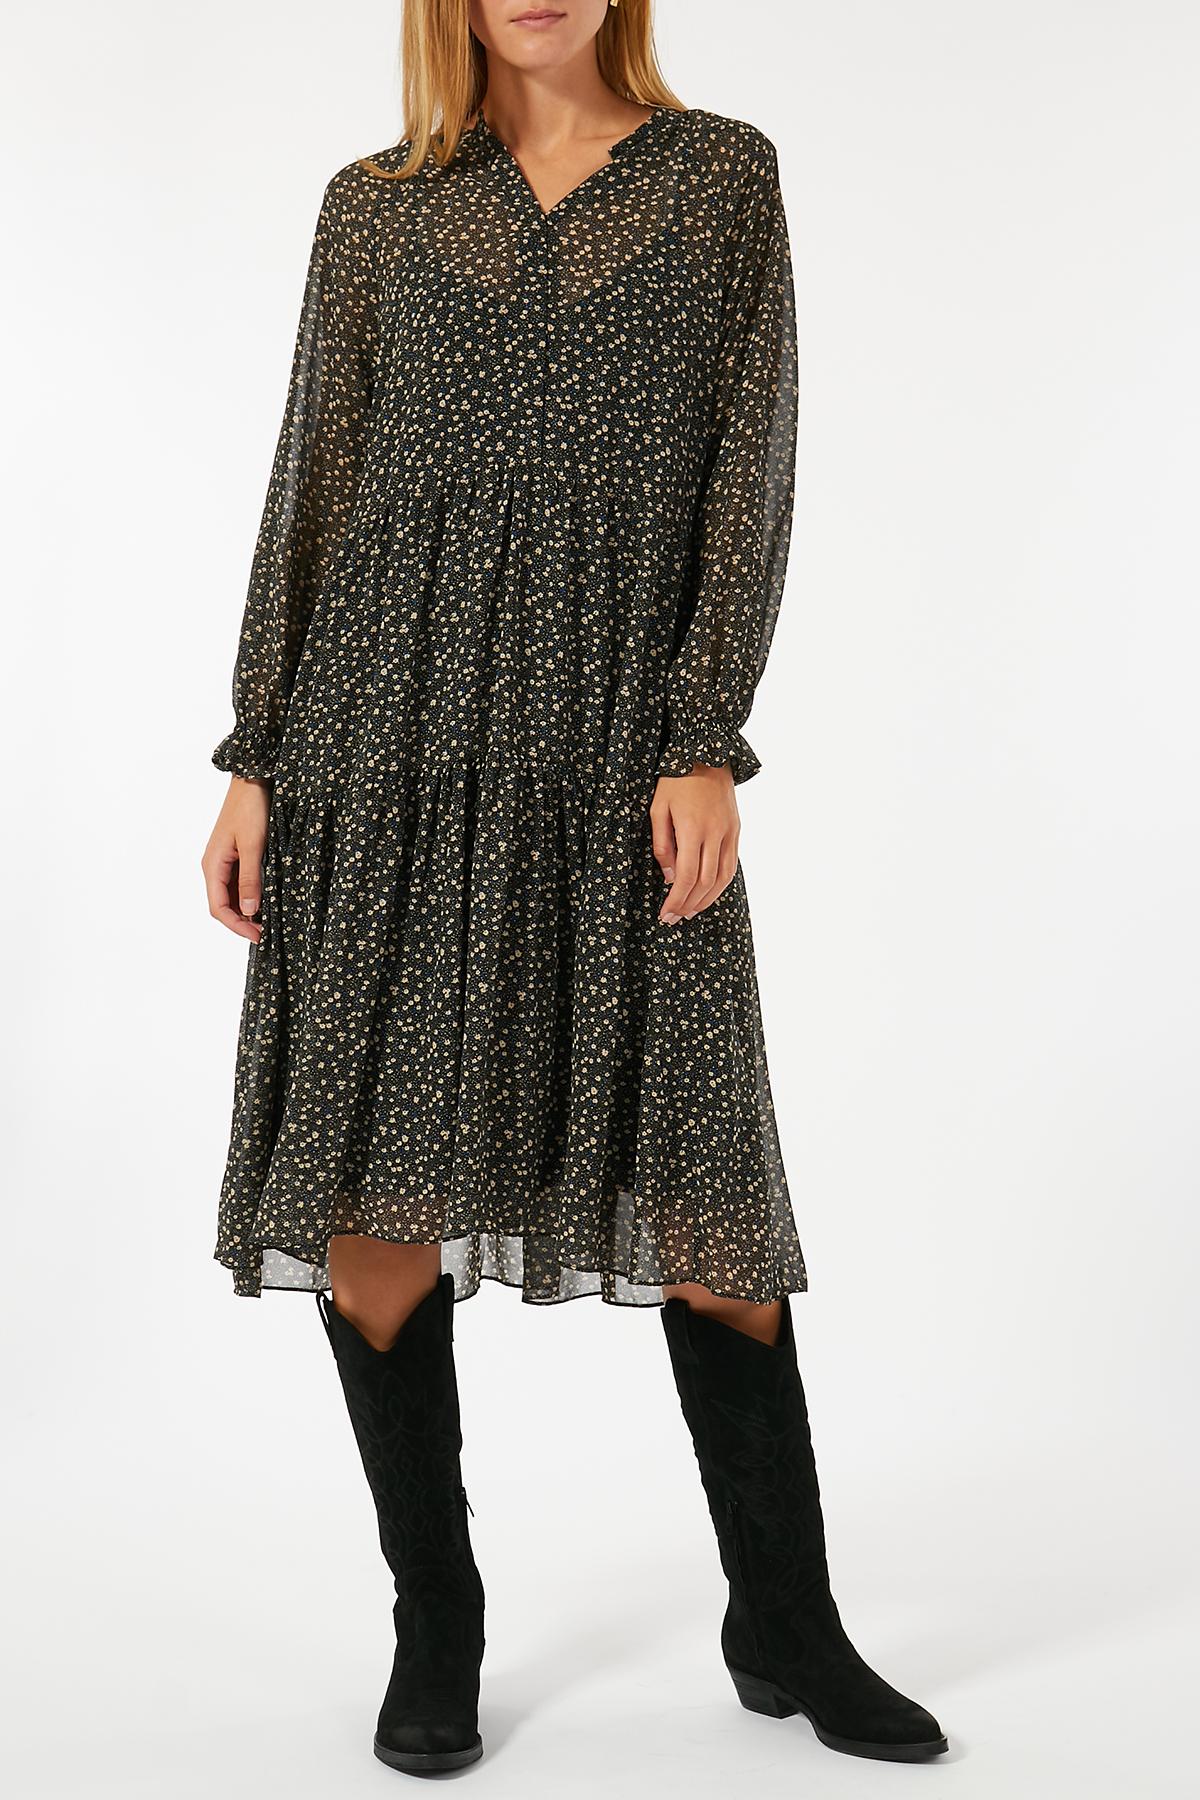 Midi-Kleid Della mit Blumen-Print | SECOND FEMALE ...